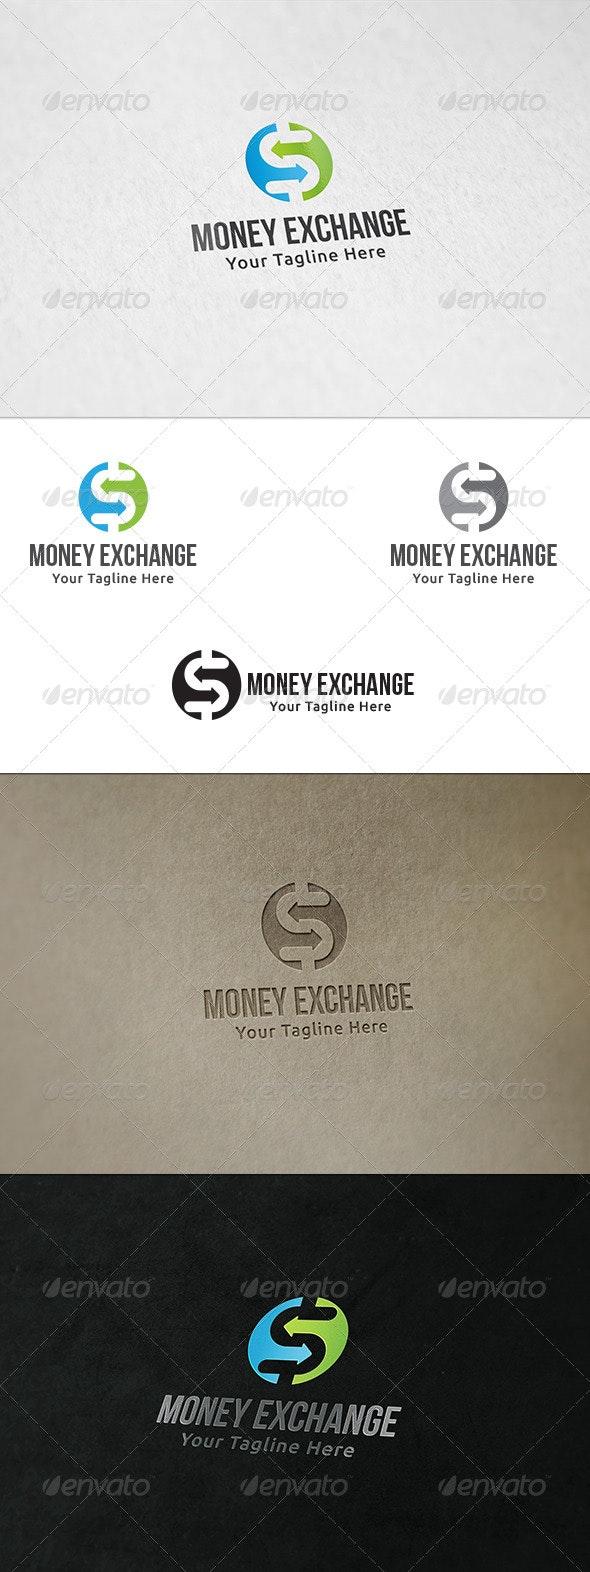 Money Exchange - Logo Template - Vector Abstract